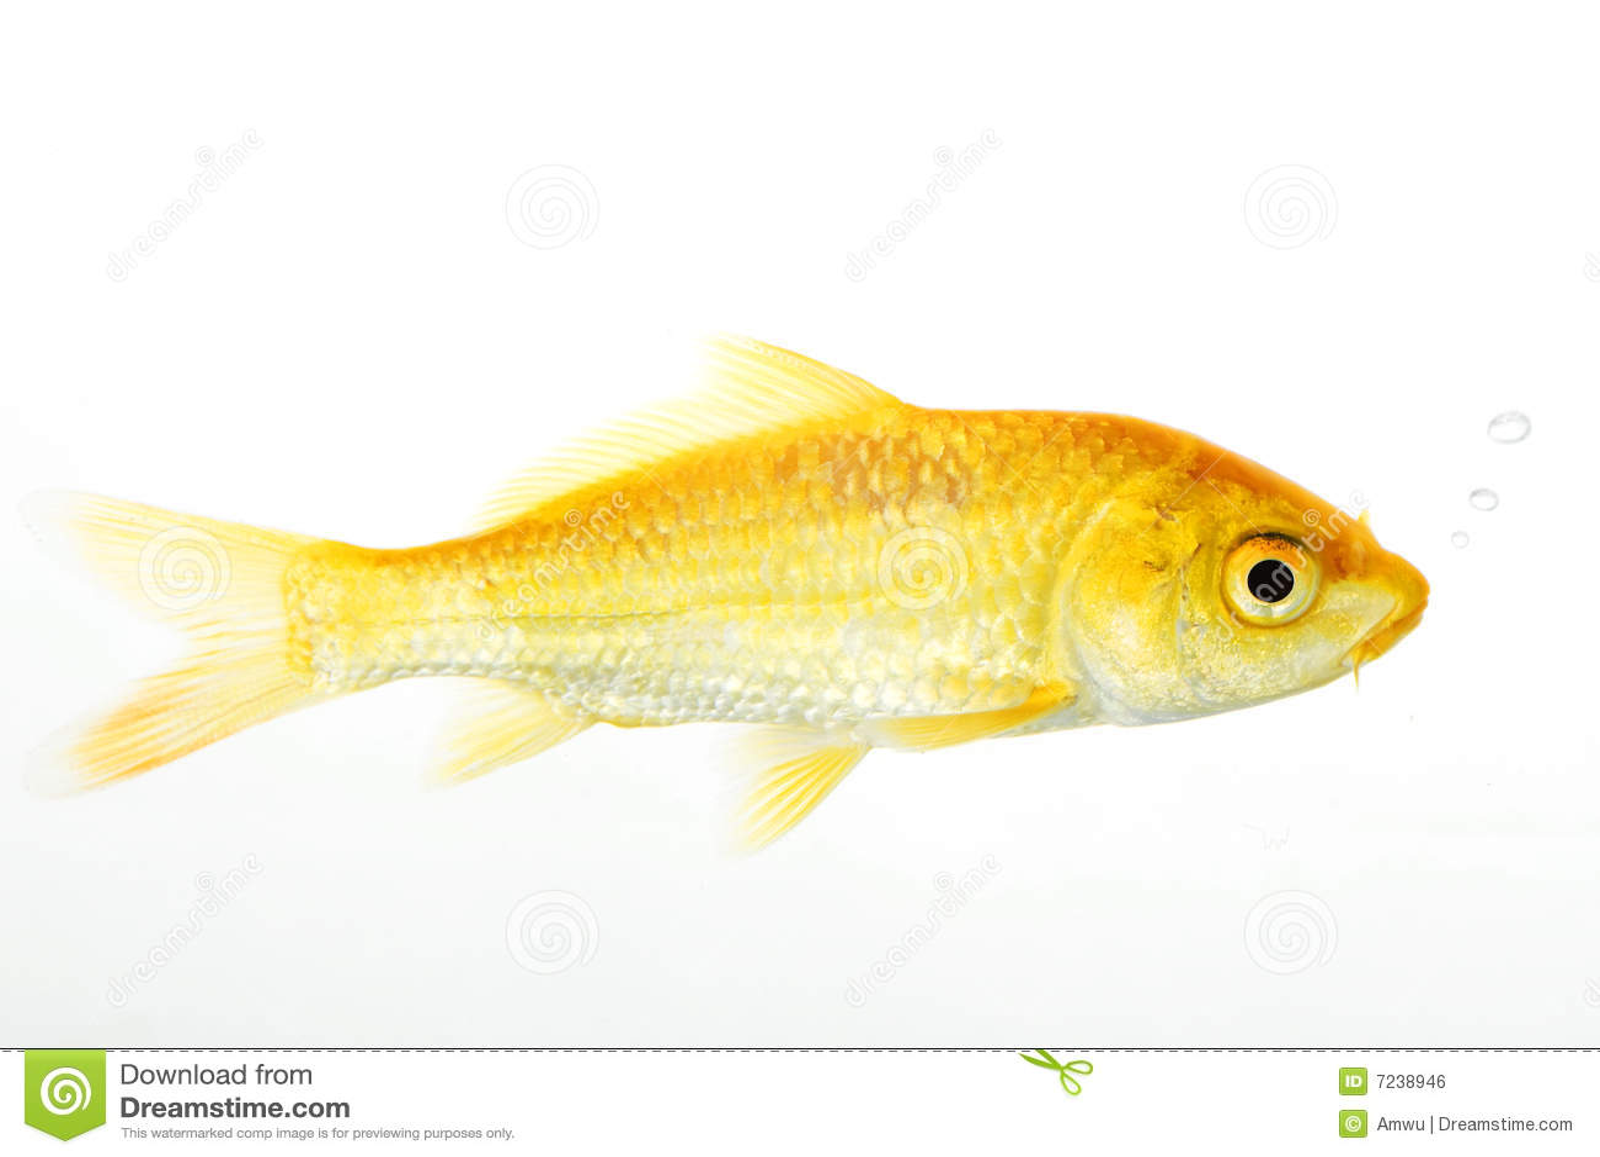 Golden koi fish stock photo image of biology space fish for Price of koi fish